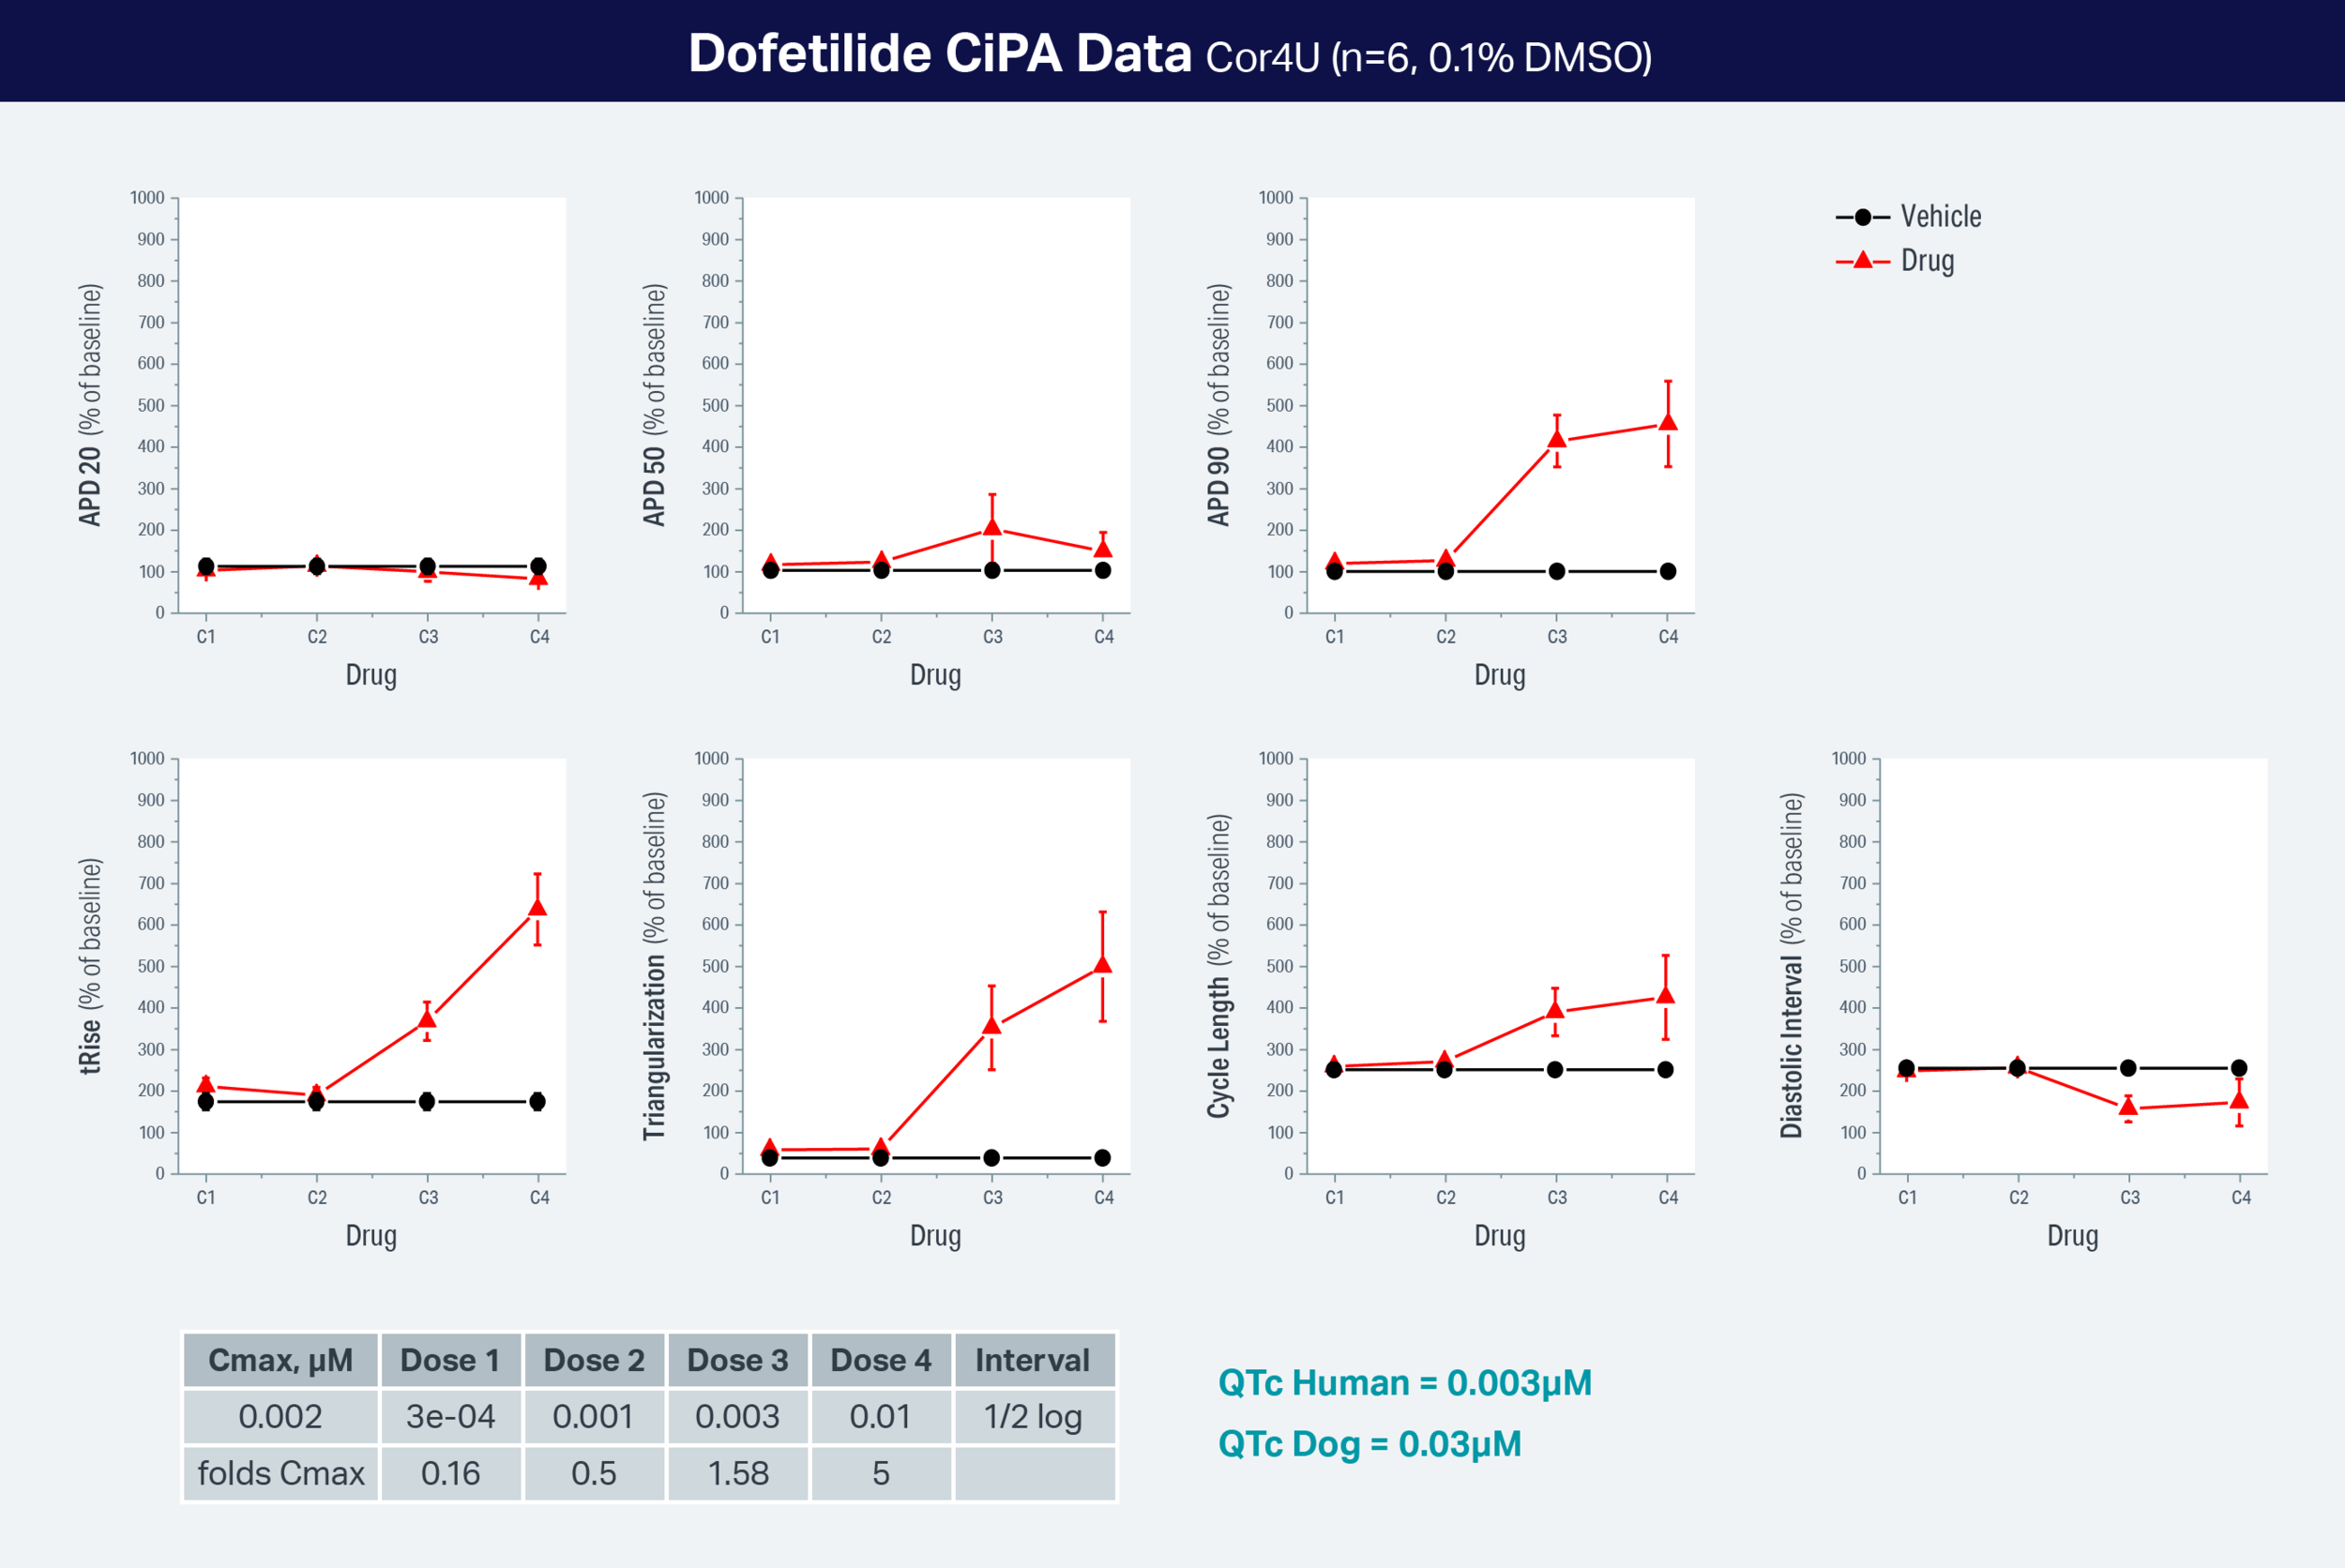 Typical CiPA Data – Dofetilide. From a Clyde Biosciences CiPA Assay